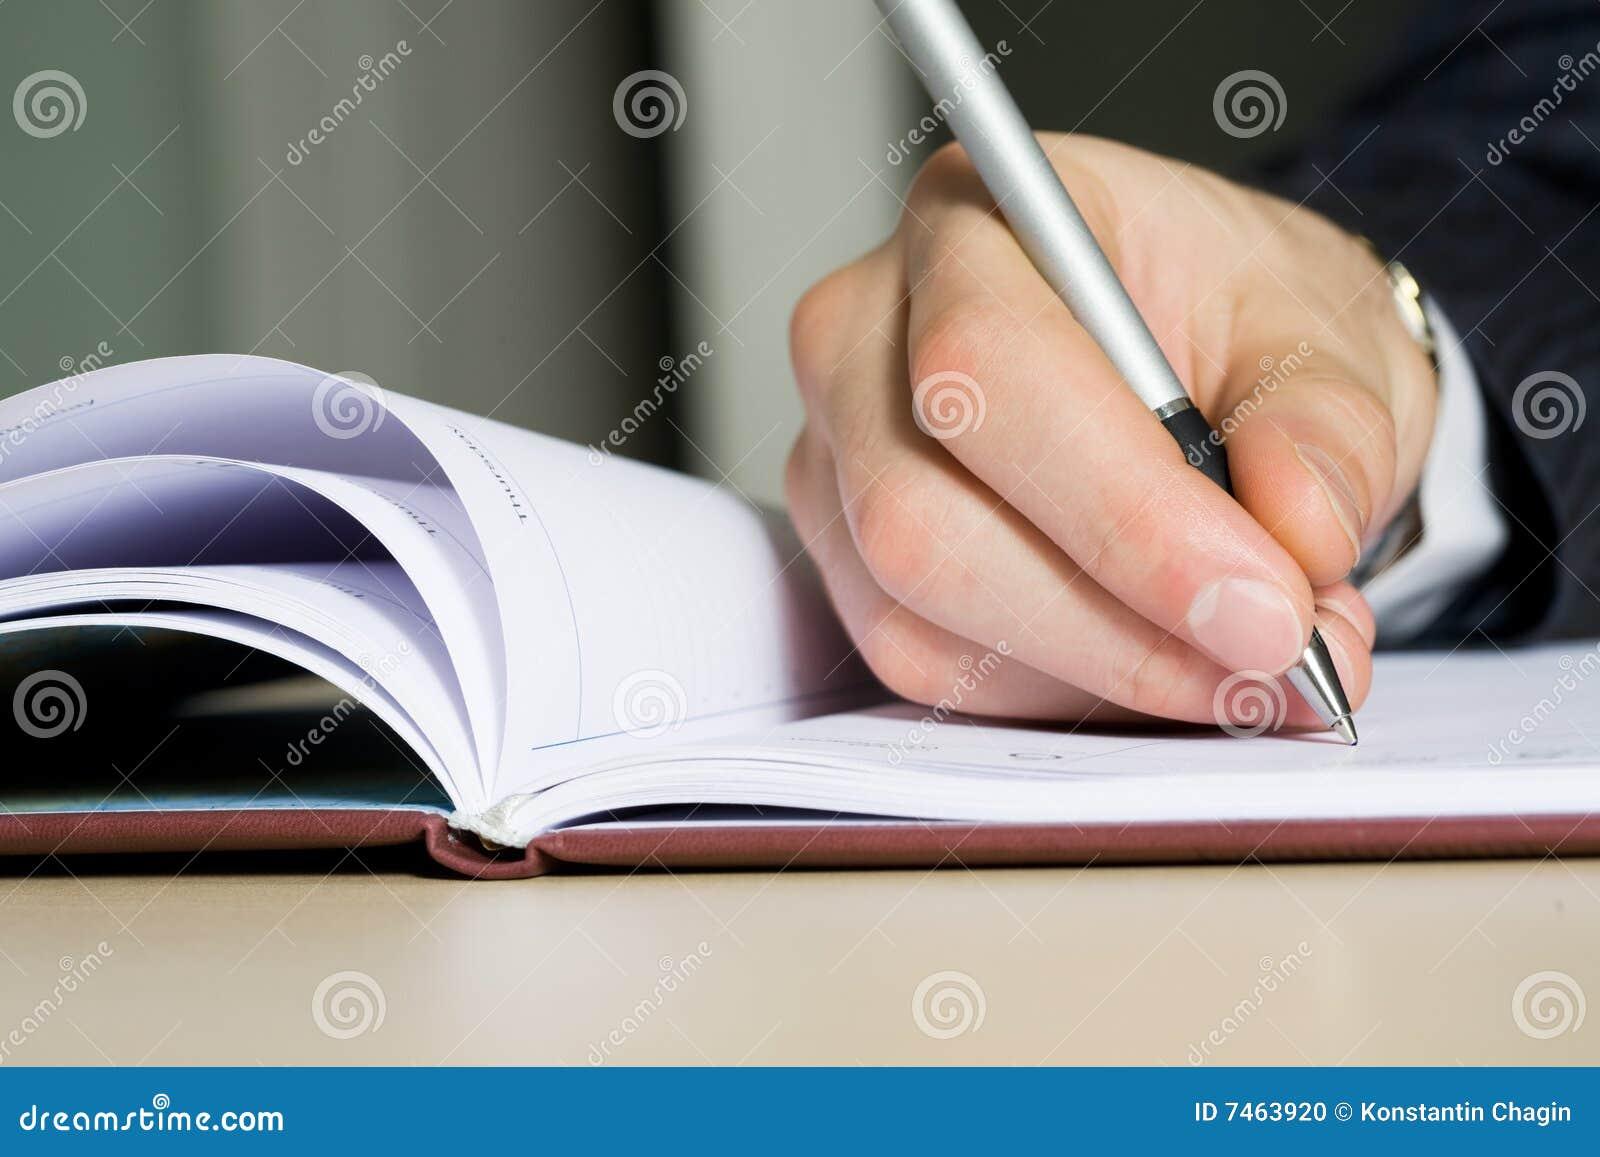 Dissertation On The Media